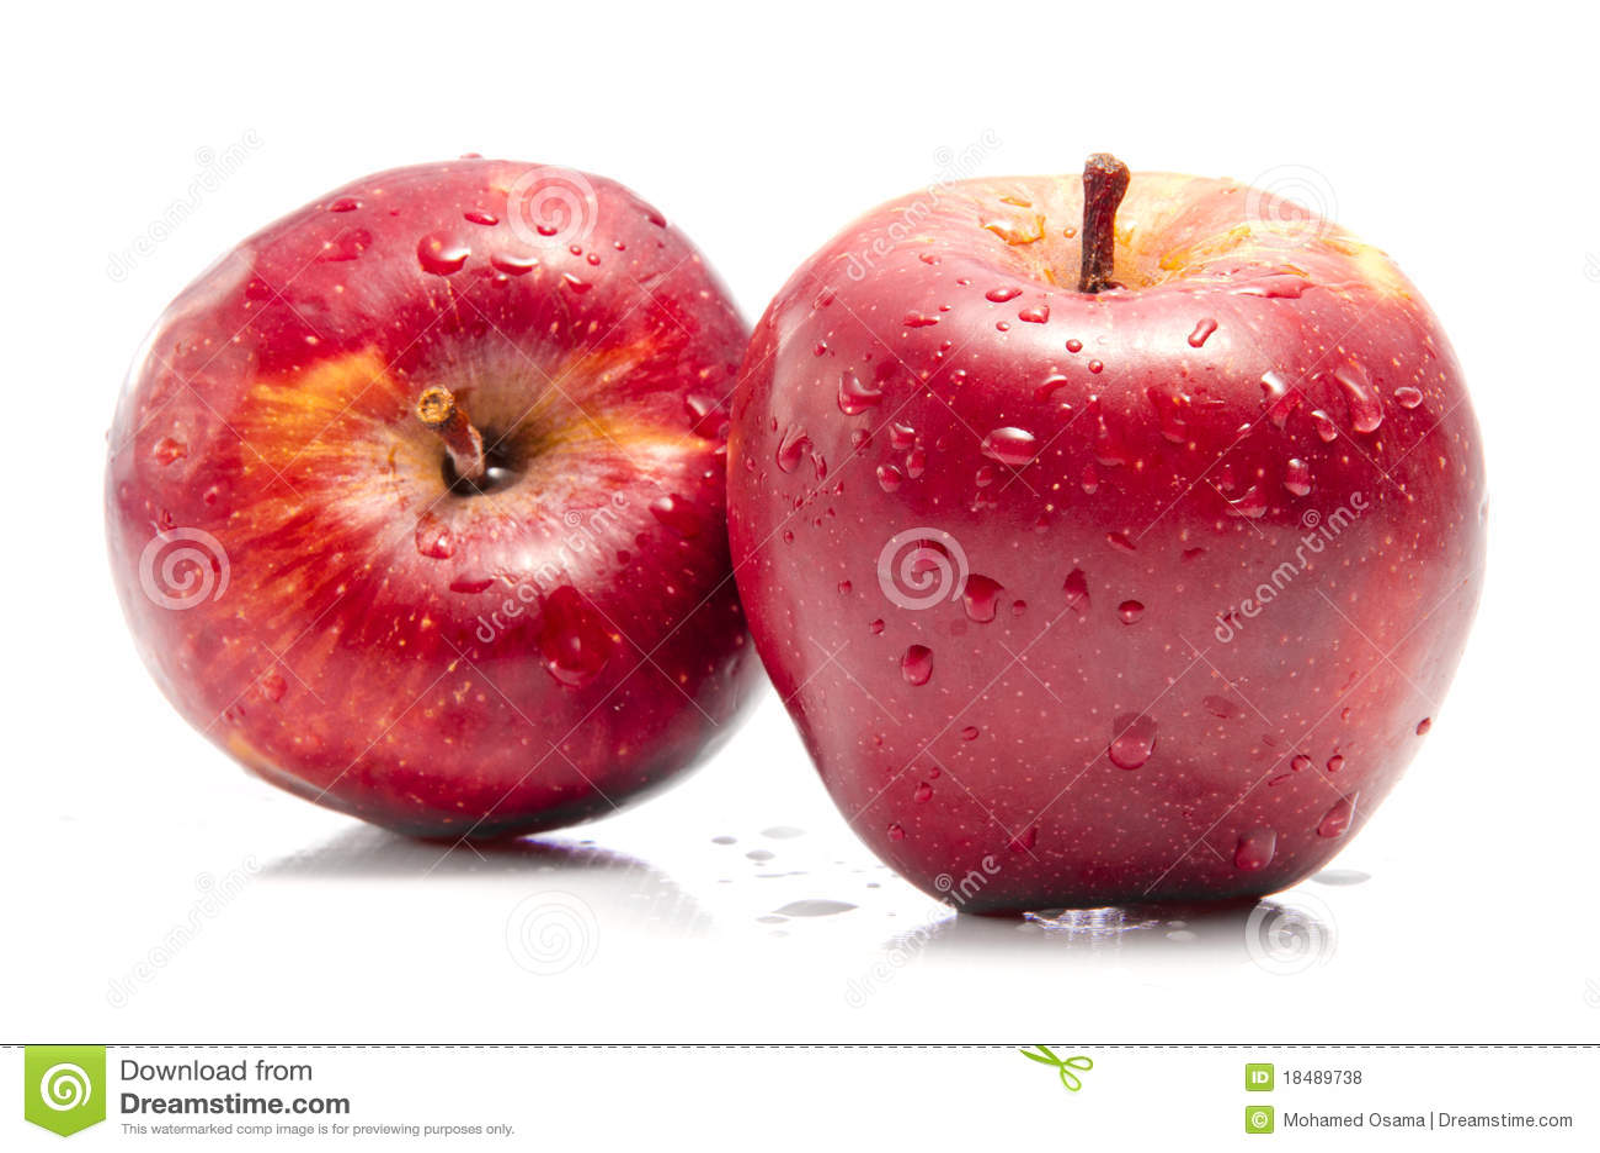 Fresh Apples Stock Photo Image Of Juicy Lifestyle Half